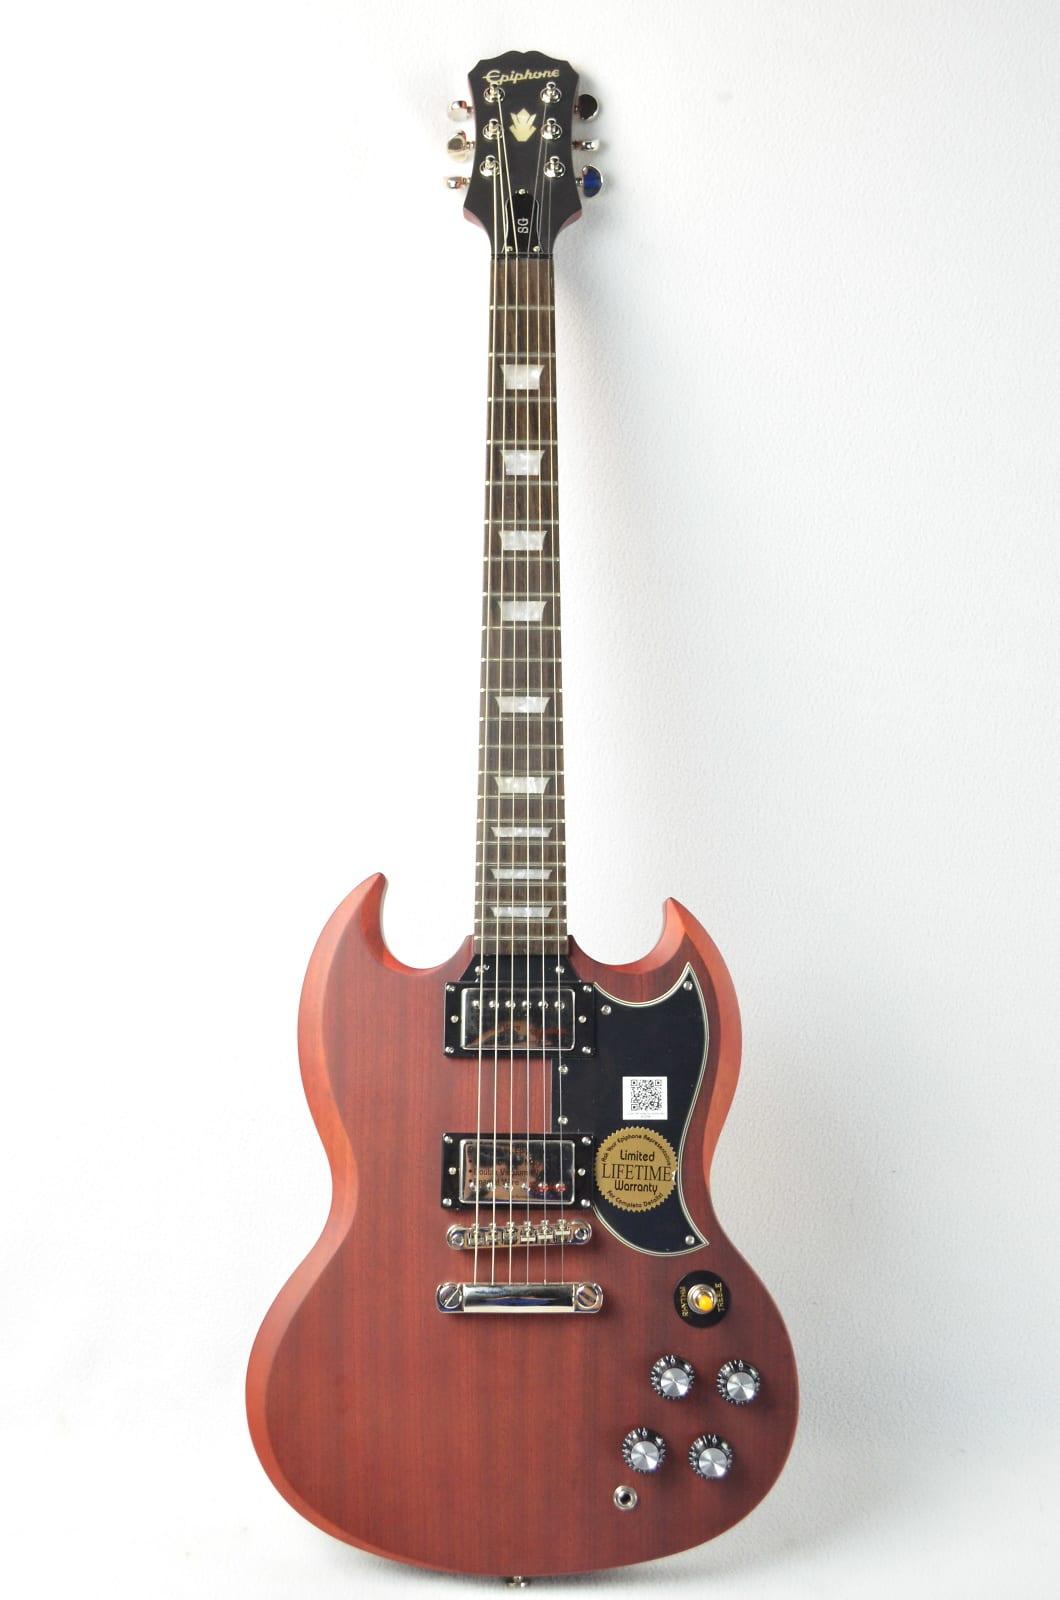 used epiphone vintage worn cherry sg g 400 electric guitar. Black Bedroom Furniture Sets. Home Design Ideas